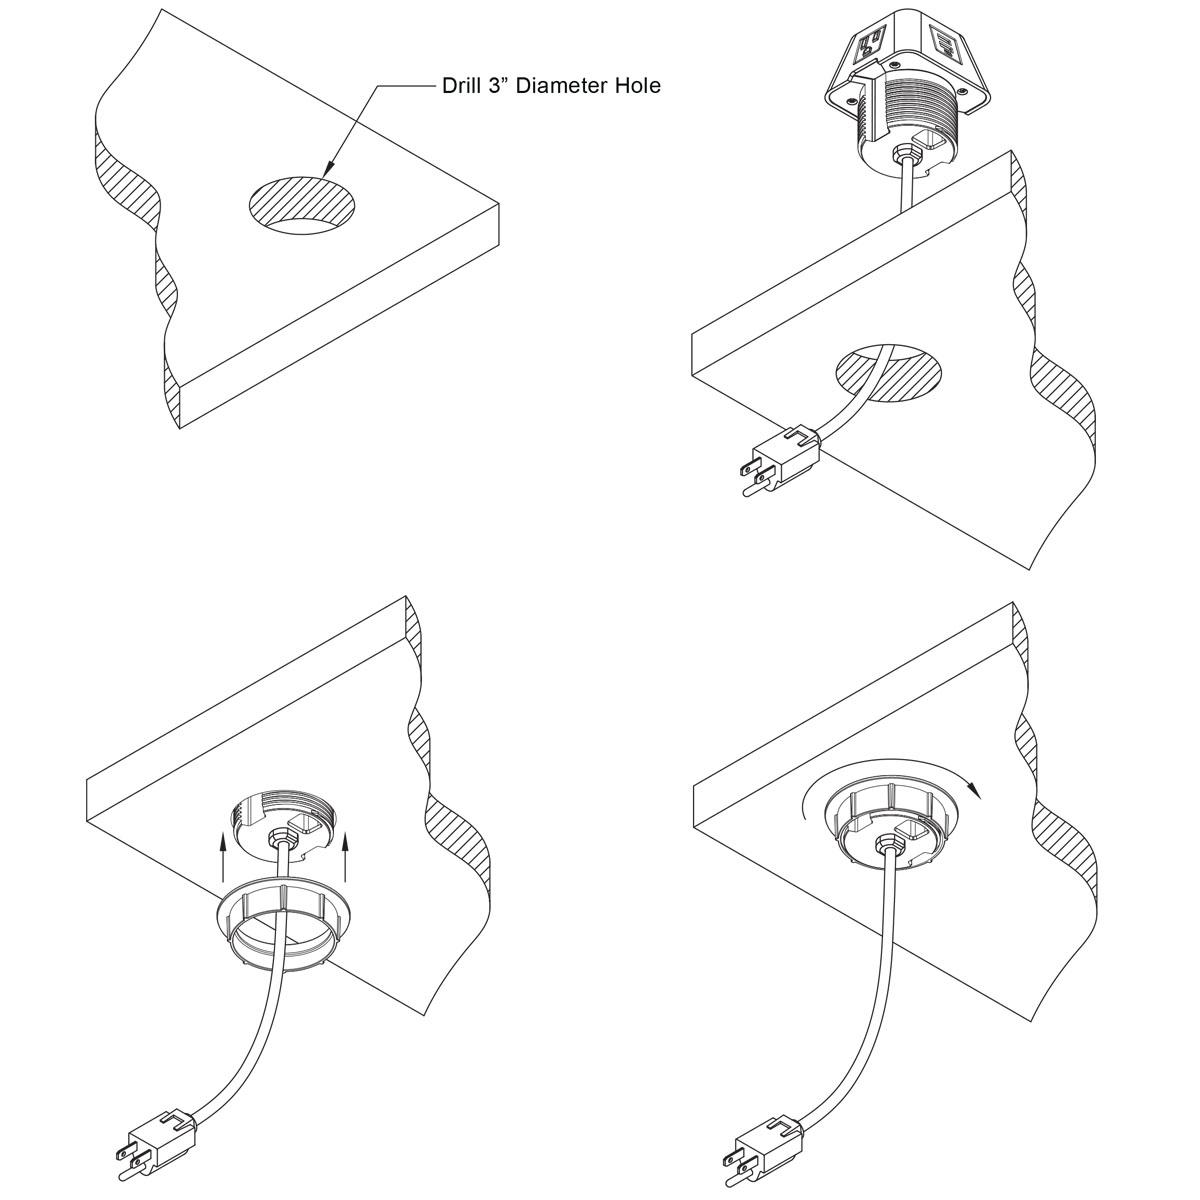 Usb Flash Drive Parts Diagram Wireless LAN Diagram